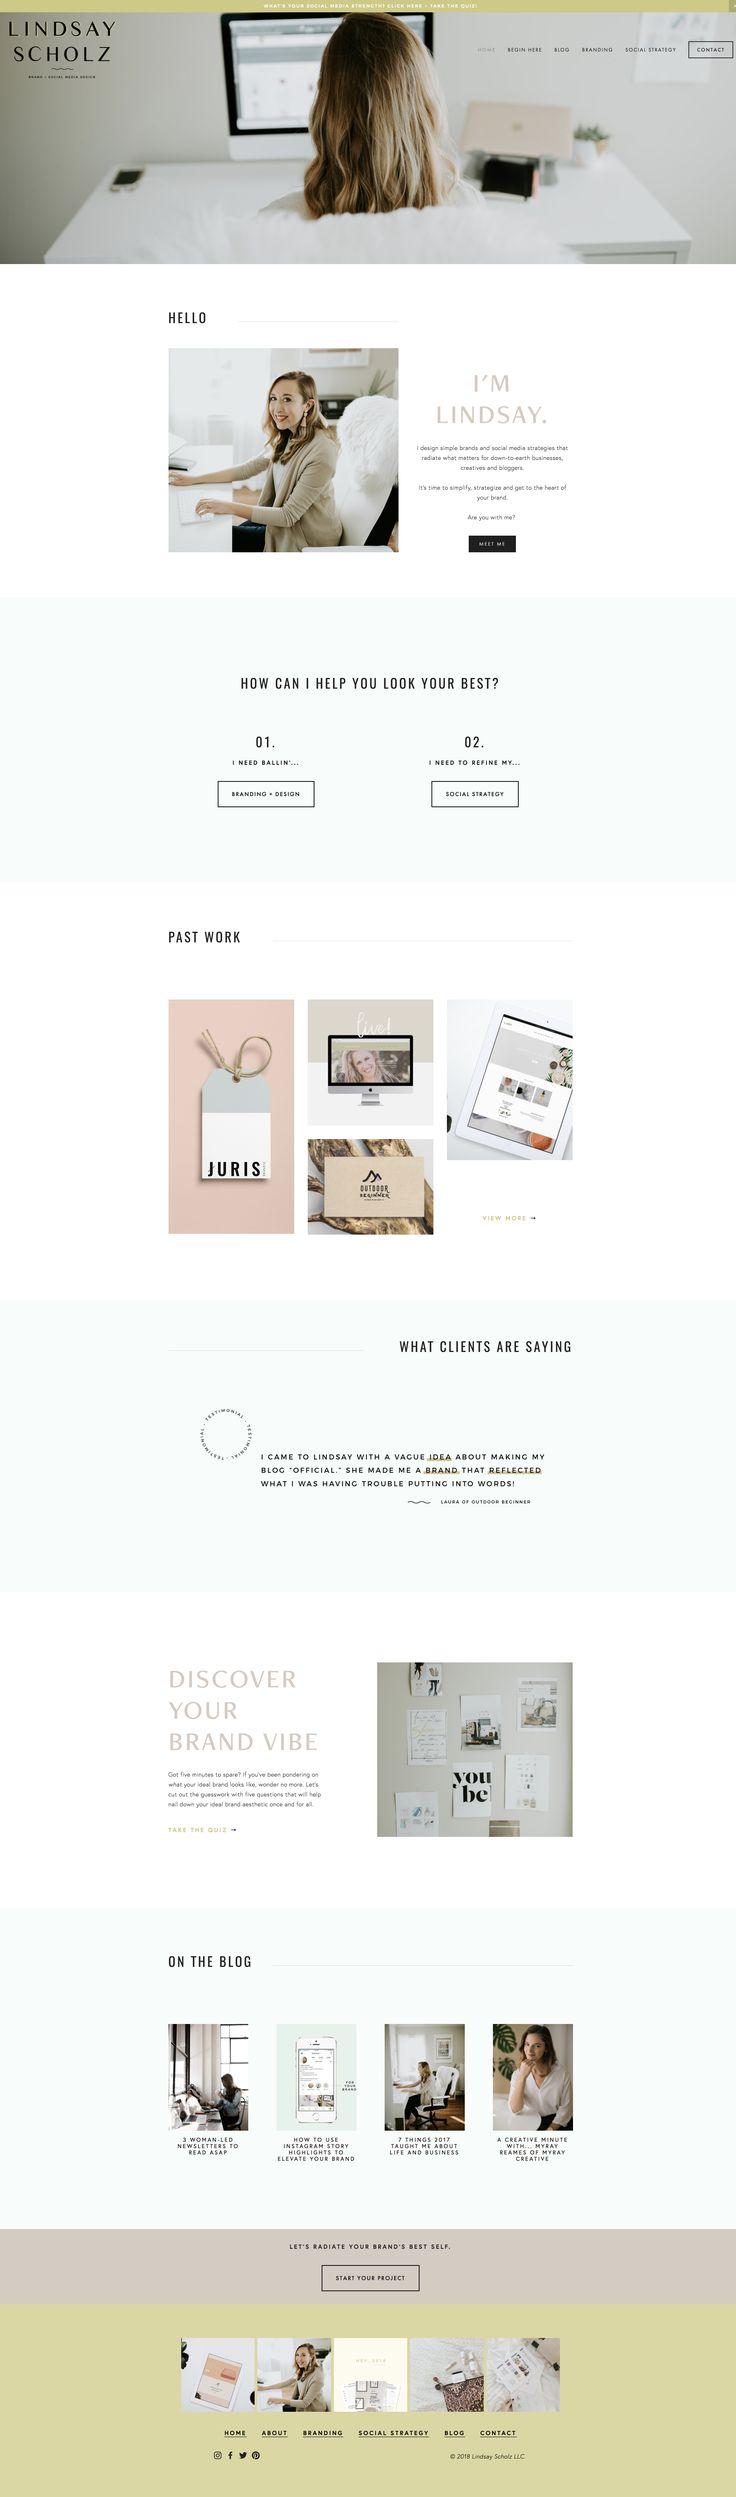 LindsayScholz.com Website Design | squarespace design, web design tips, personal website examples, brand identity, personal brand